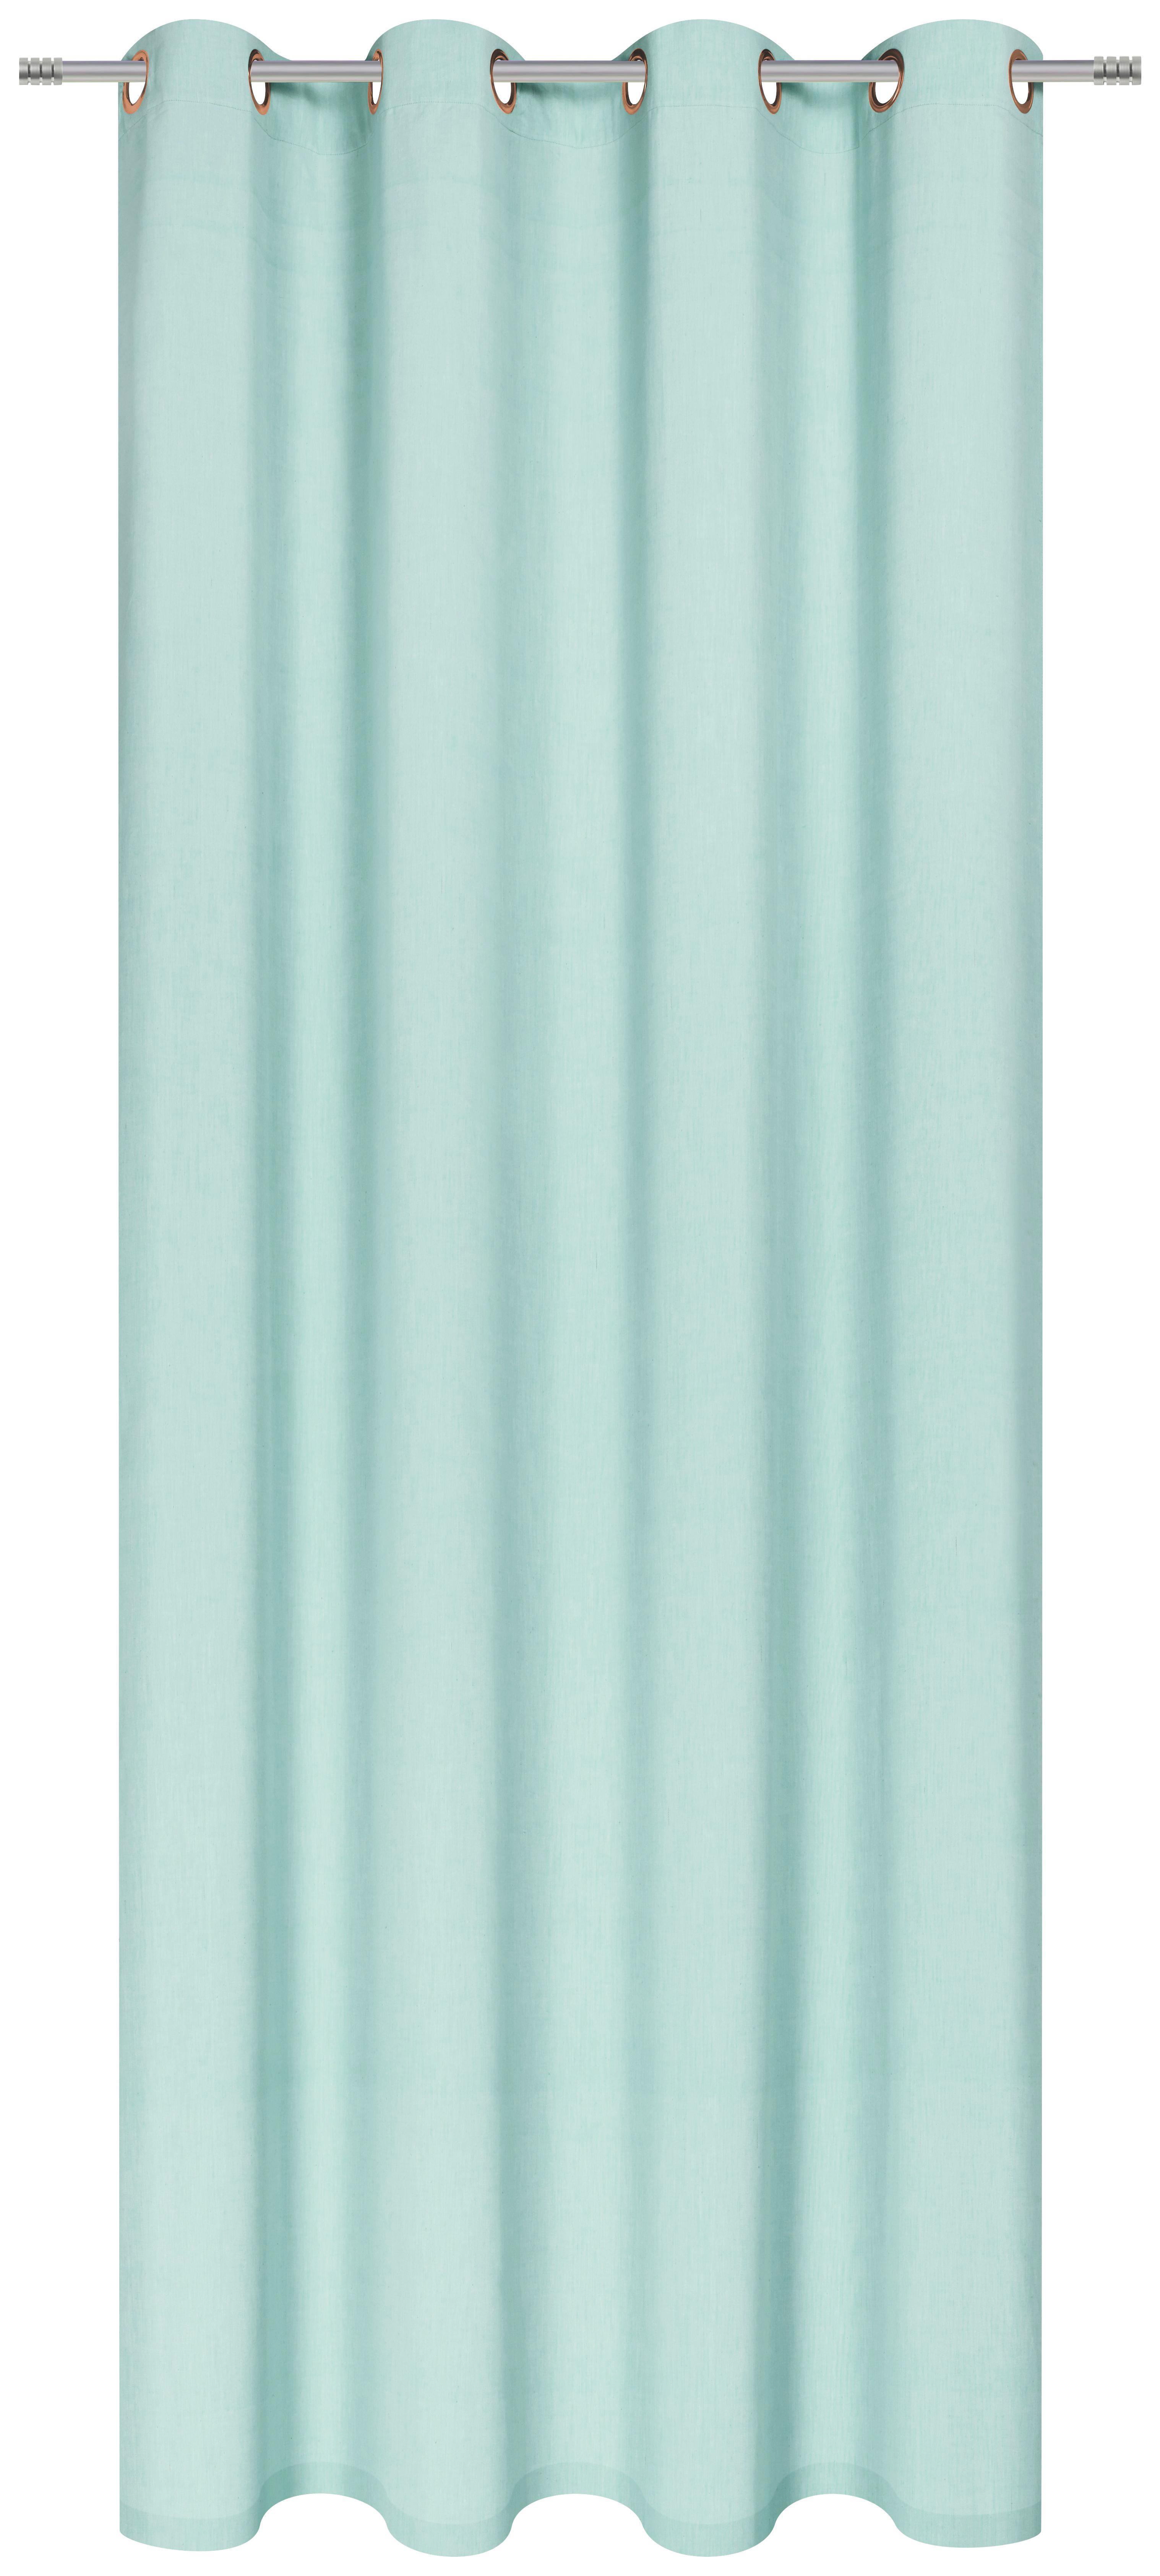 Készfüggöny Noah - türkiz, romantikus/Landhaus, textil (140/250cm) - MÖMAX modern living